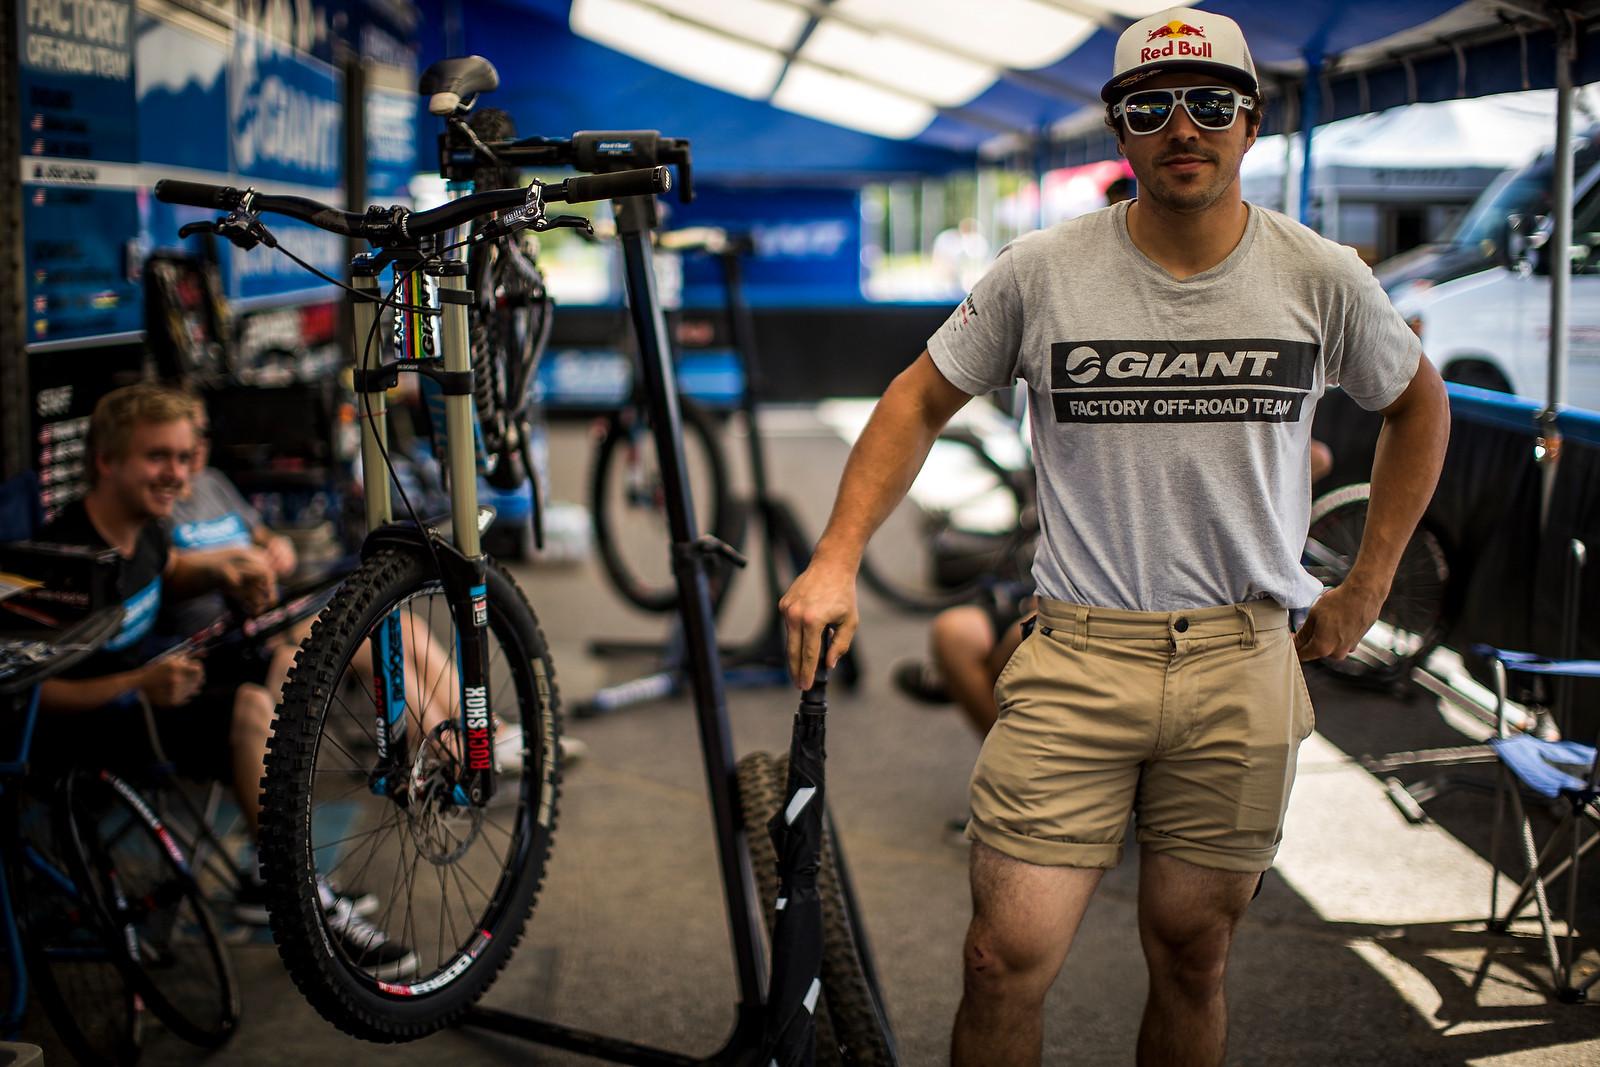 Marcelo Gutierrez Euro-style at Mont Sainte Anne - PIT BITS, Track Walk - It's On at Mont Sainte Anne World Cup - Mountain Biking Pictures - Vital MTB